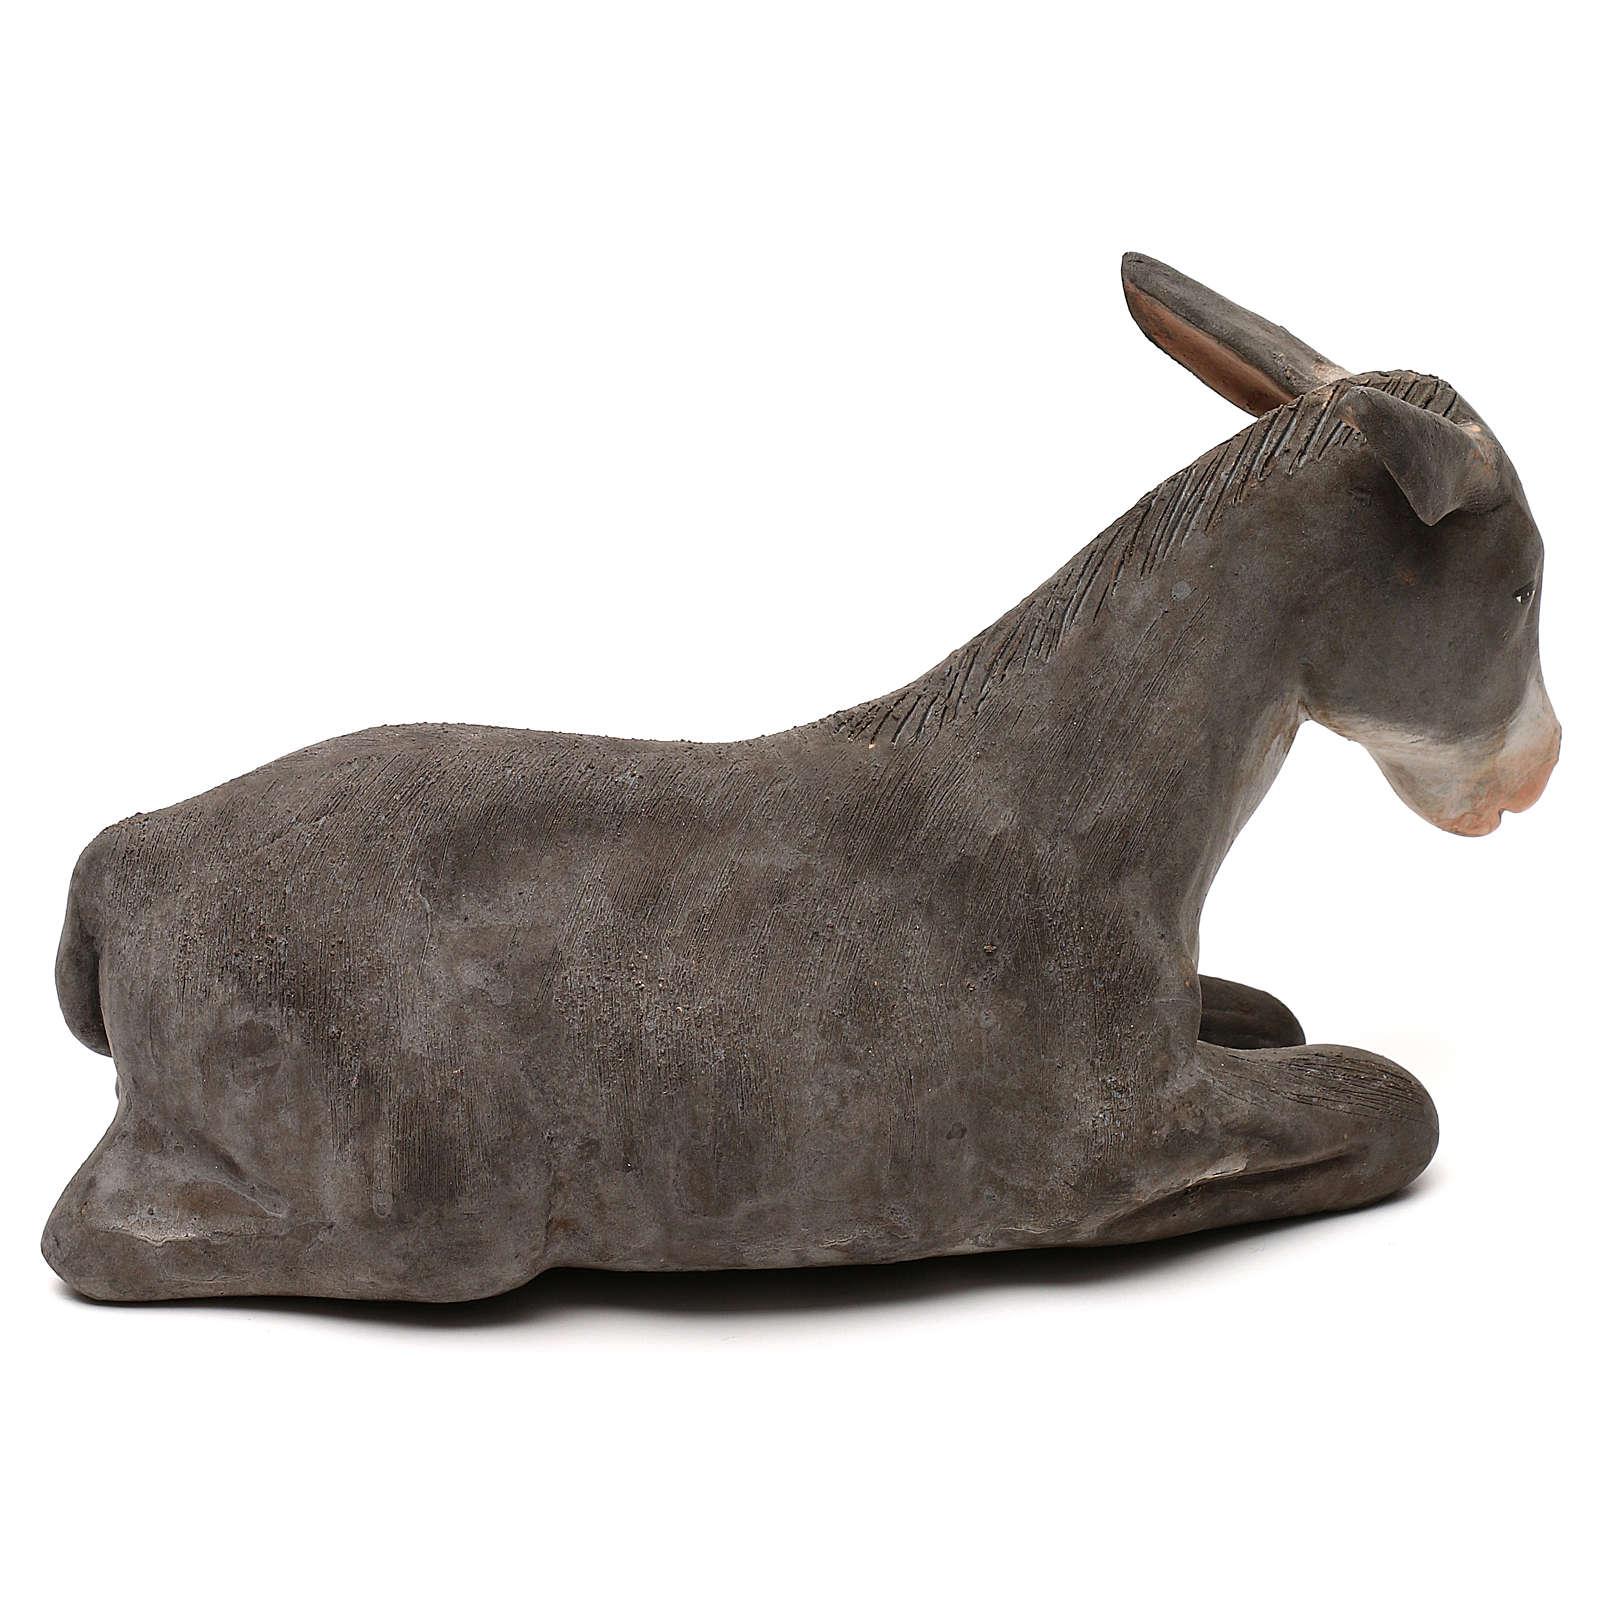 STOCK Burro de terracota de 18 cm belén napolitano 4